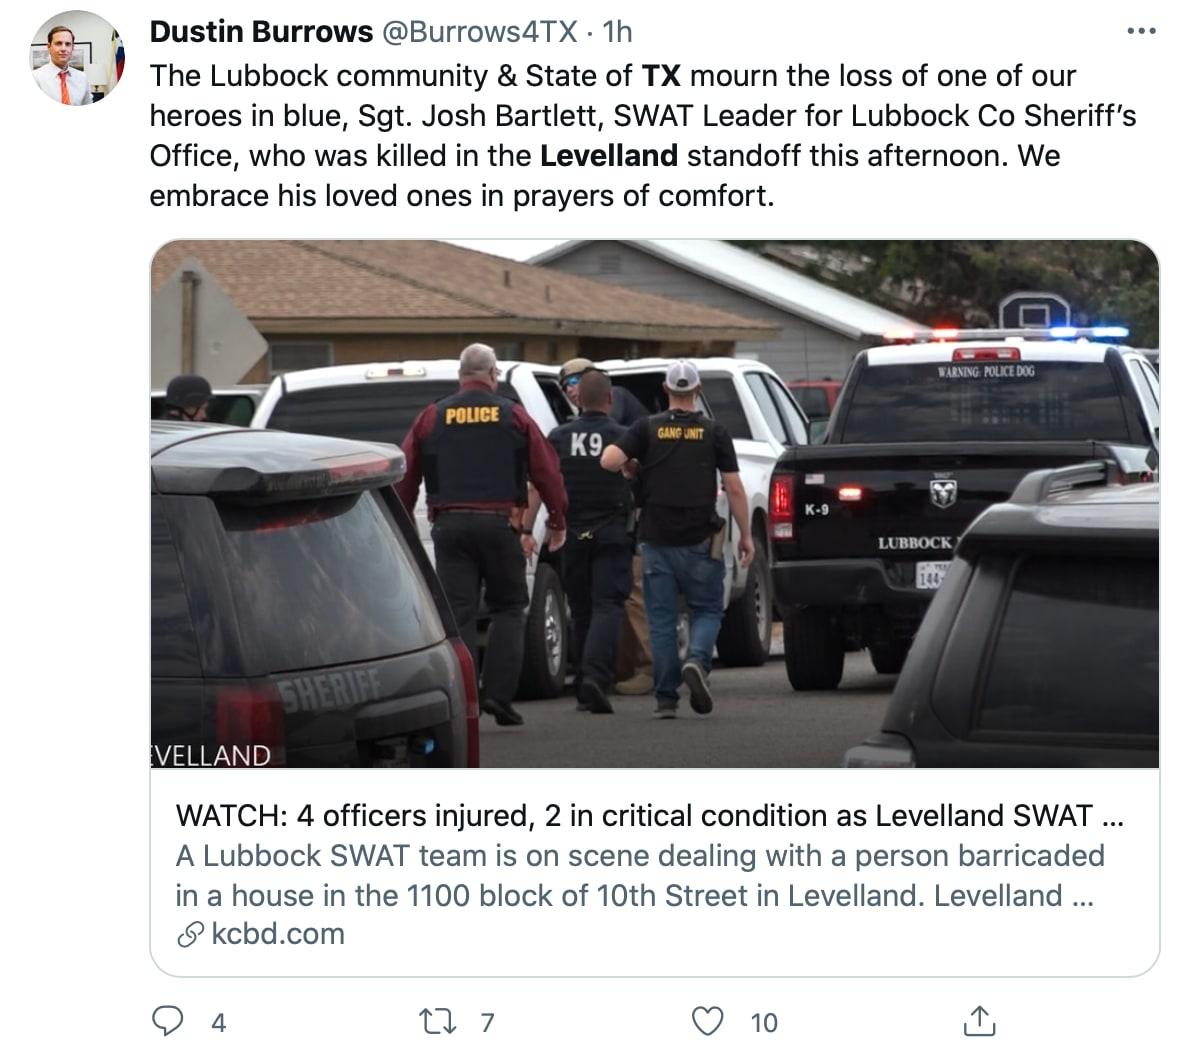 Tiroteo Levelland: Un nuevo tiroteo masivo en Texas